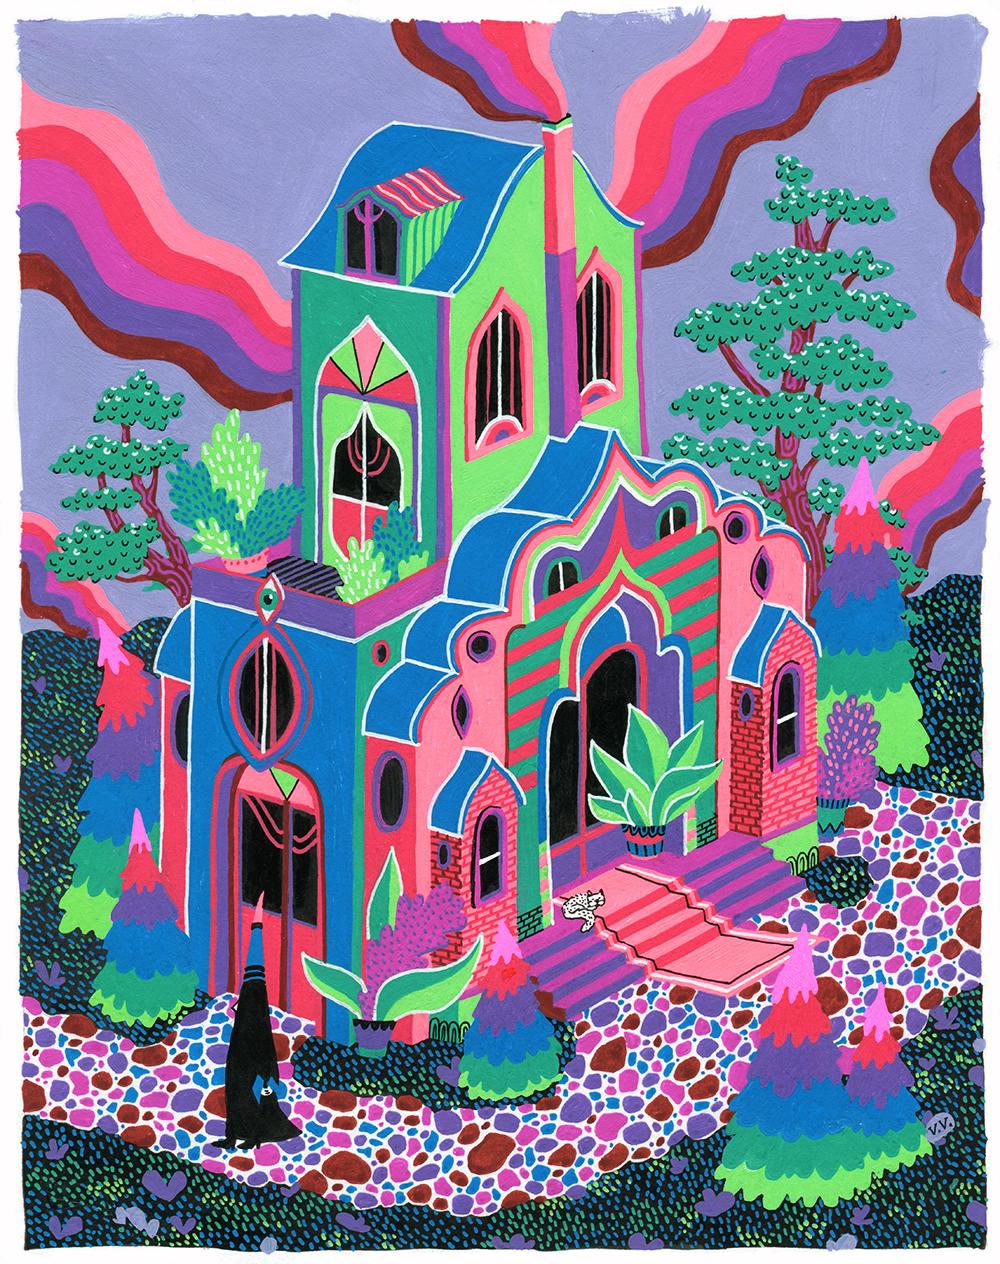 Neon House-web.jpg